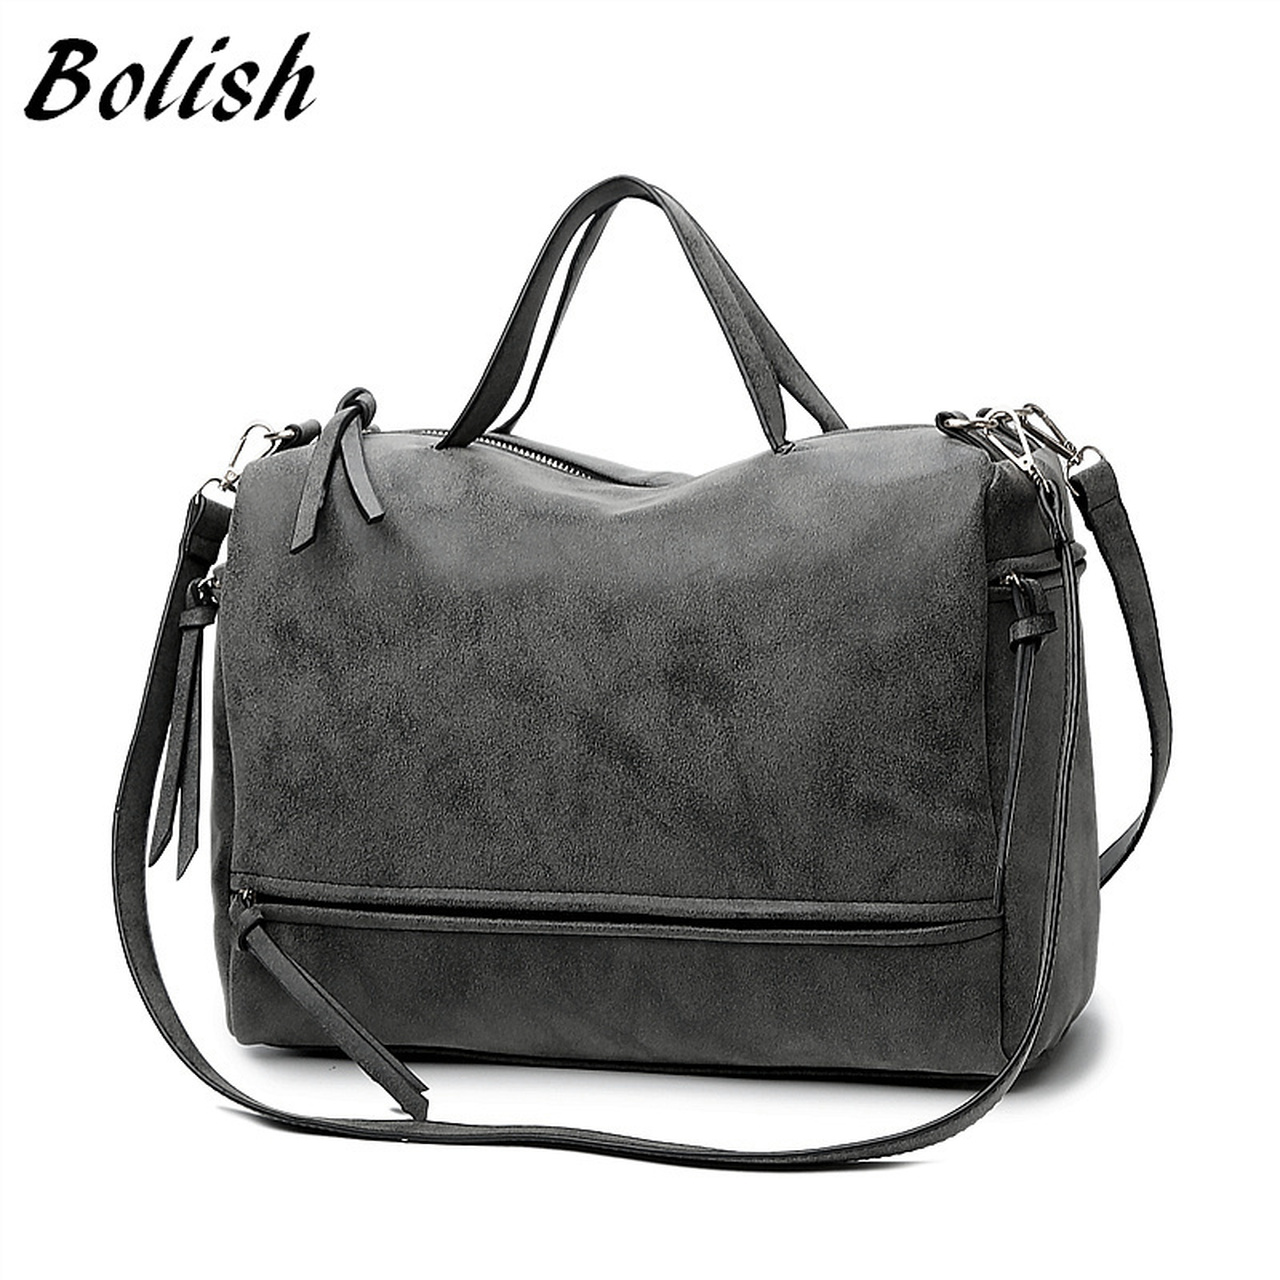 d85675d566 Bolish Brand Fashion Female Shoulder Bag Nubuck Leather women handbag  Vintage Messenger Bag Motorcycle Crossbody Bags ...